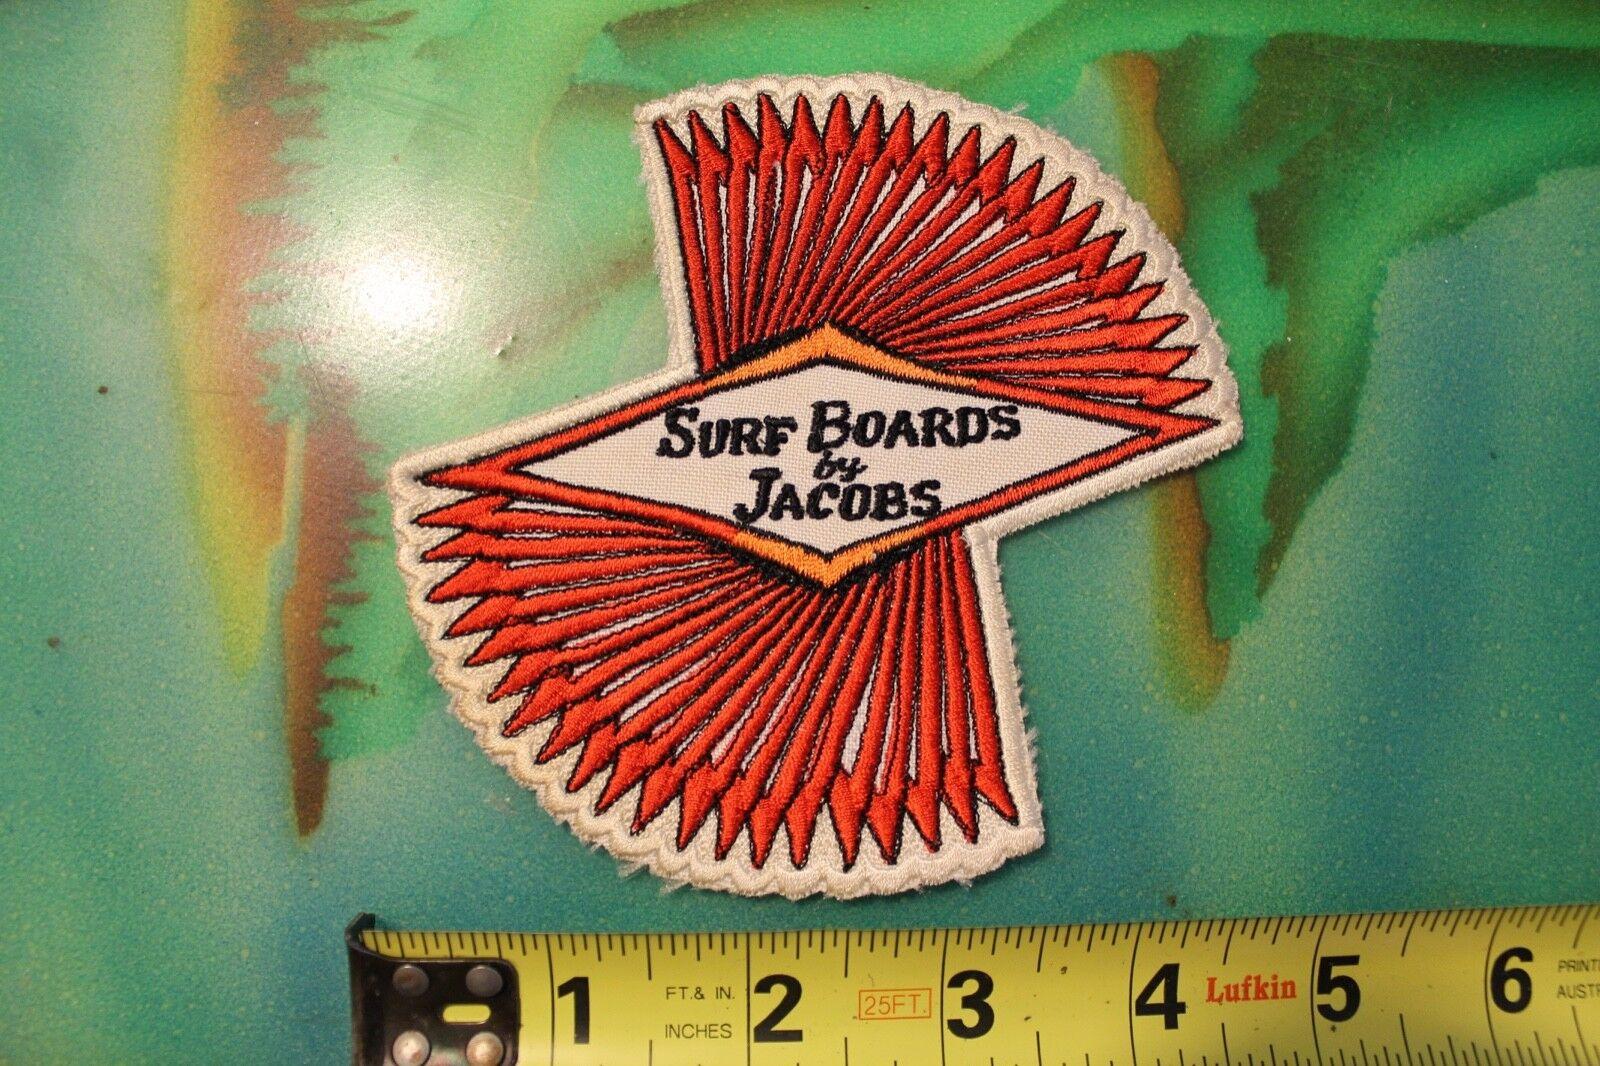 JACOBS Surfboards Hap Jacobs Velzy Rare Vintage Original 1960's Surfing PATCH